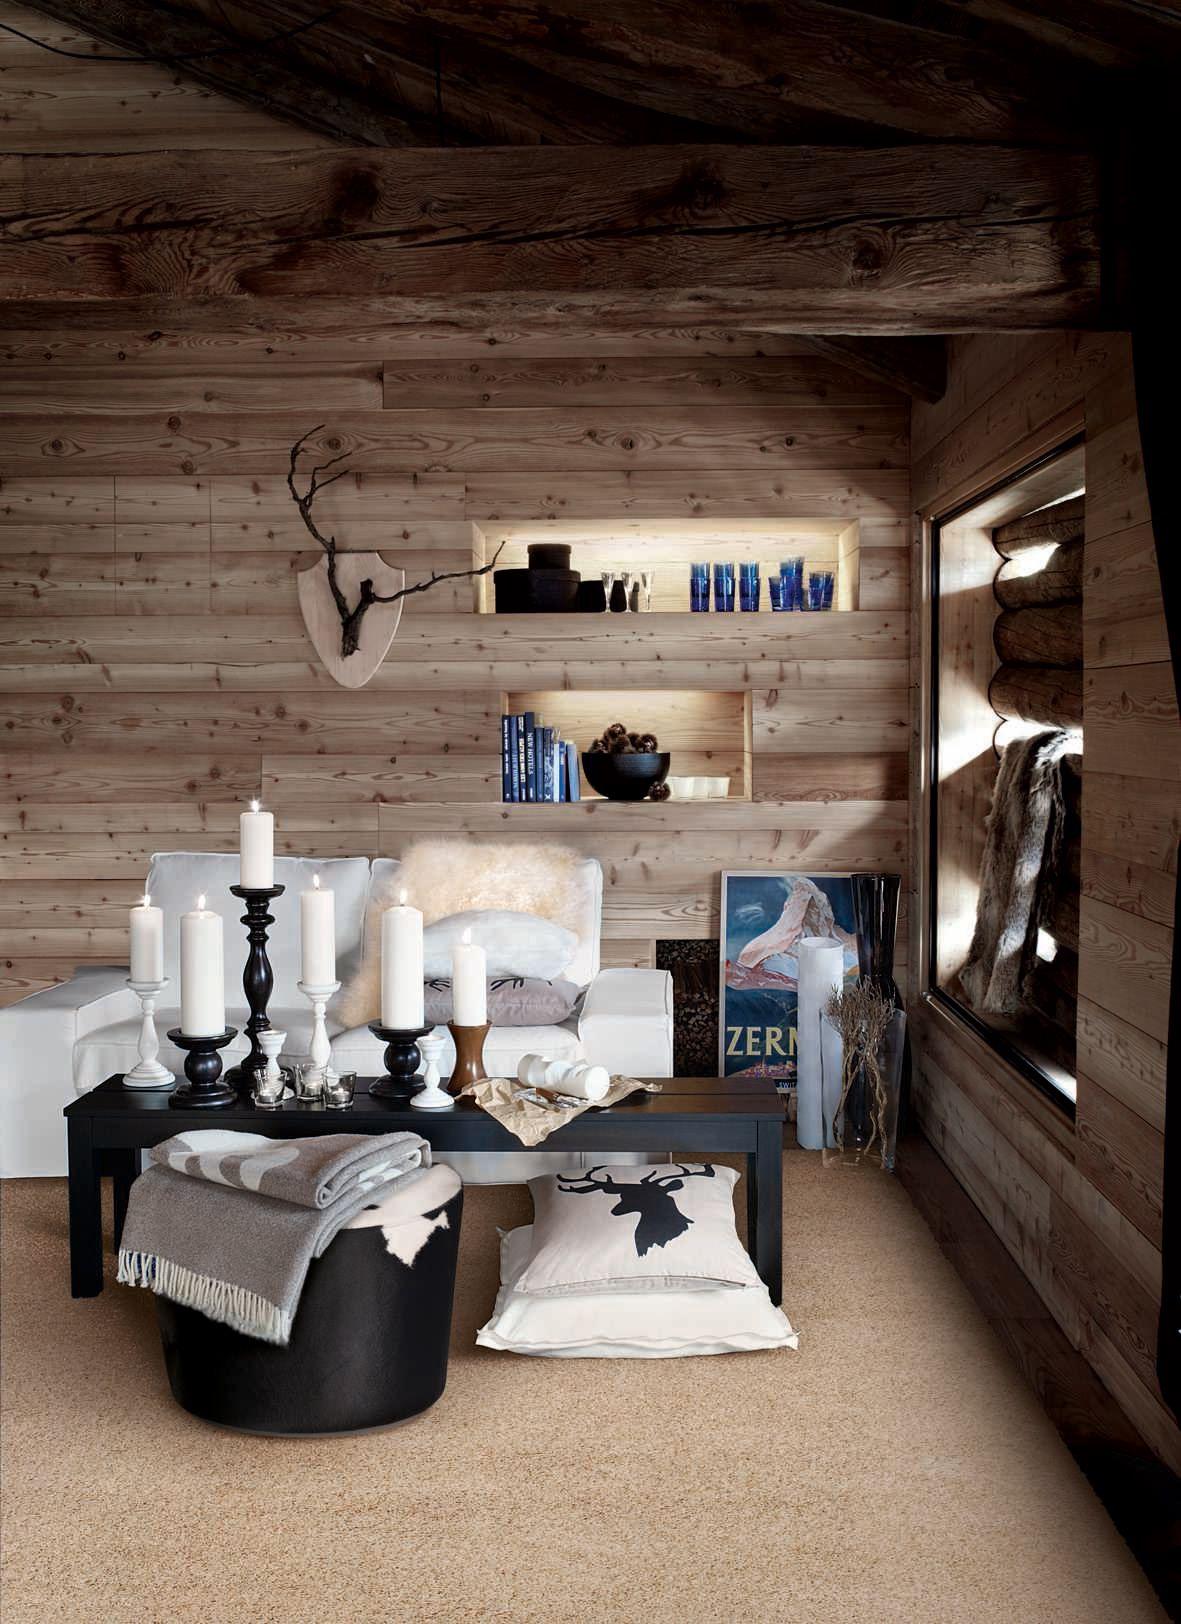 l 39 ambiance chalet deco pinterest chalet ambiance et. Black Bedroom Furniture Sets. Home Design Ideas